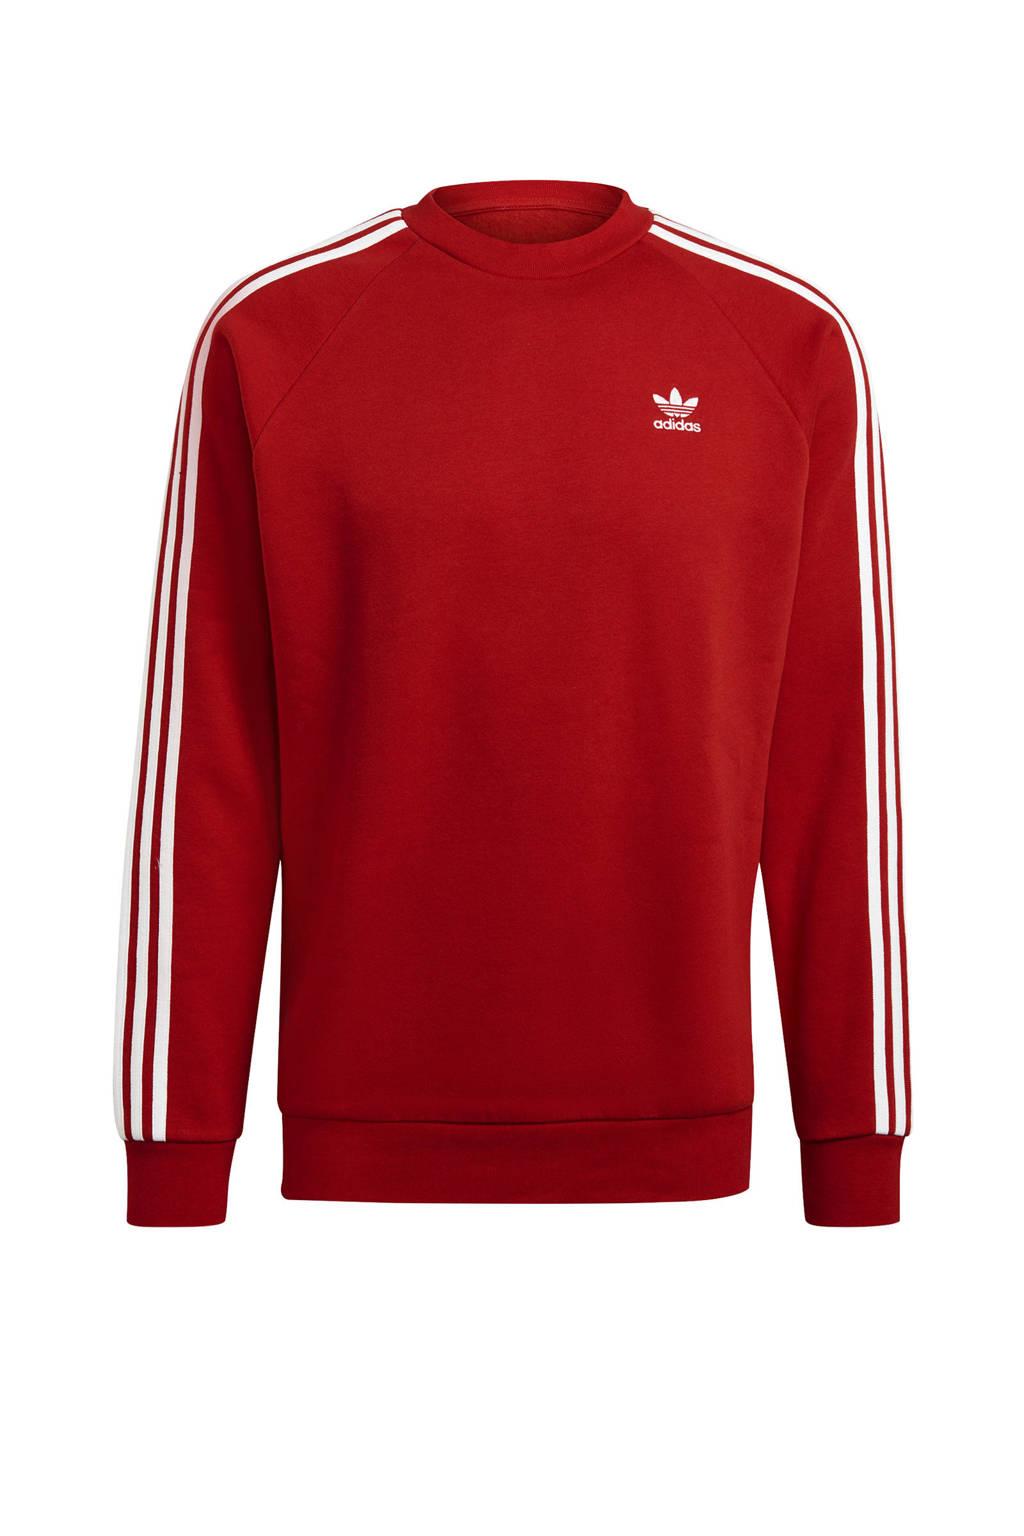 adidas Originals Adicolor sweater rood, Rood